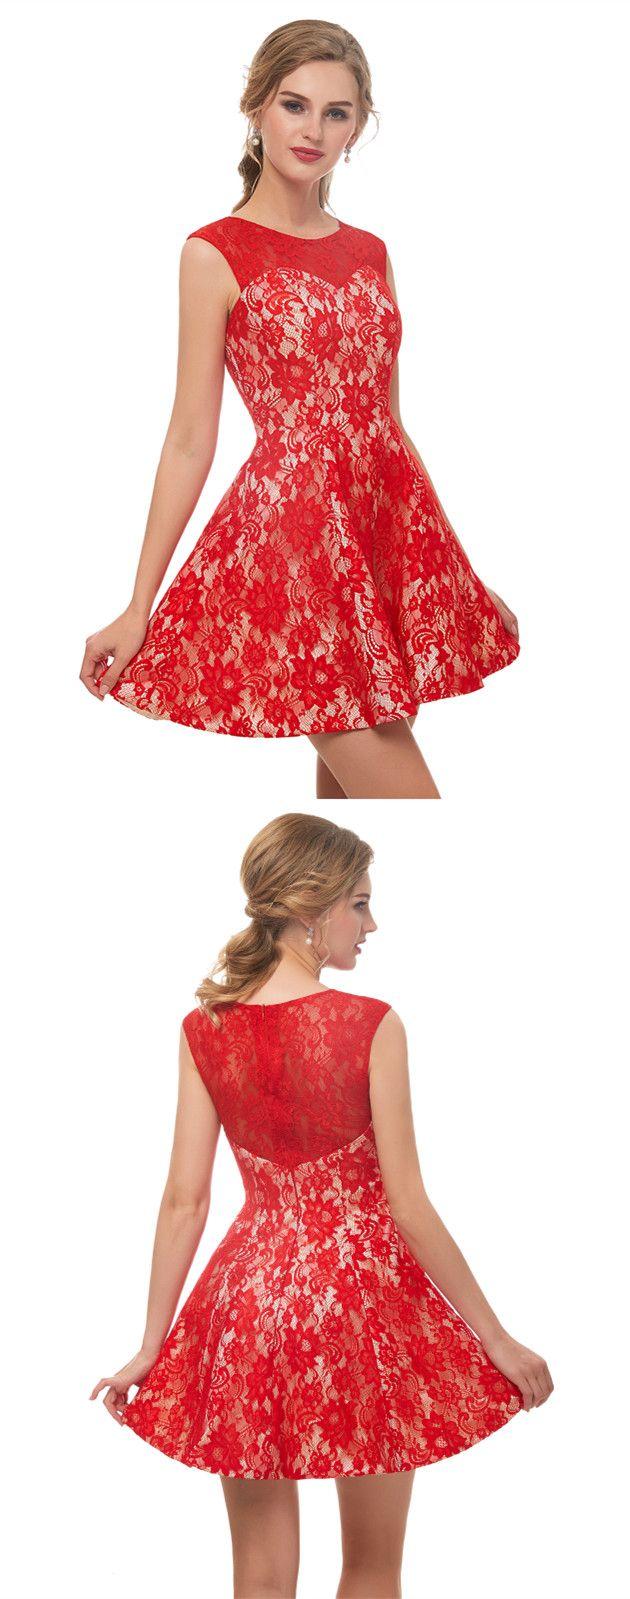 Classic sleeveless red lace prom dress k hoco dresses